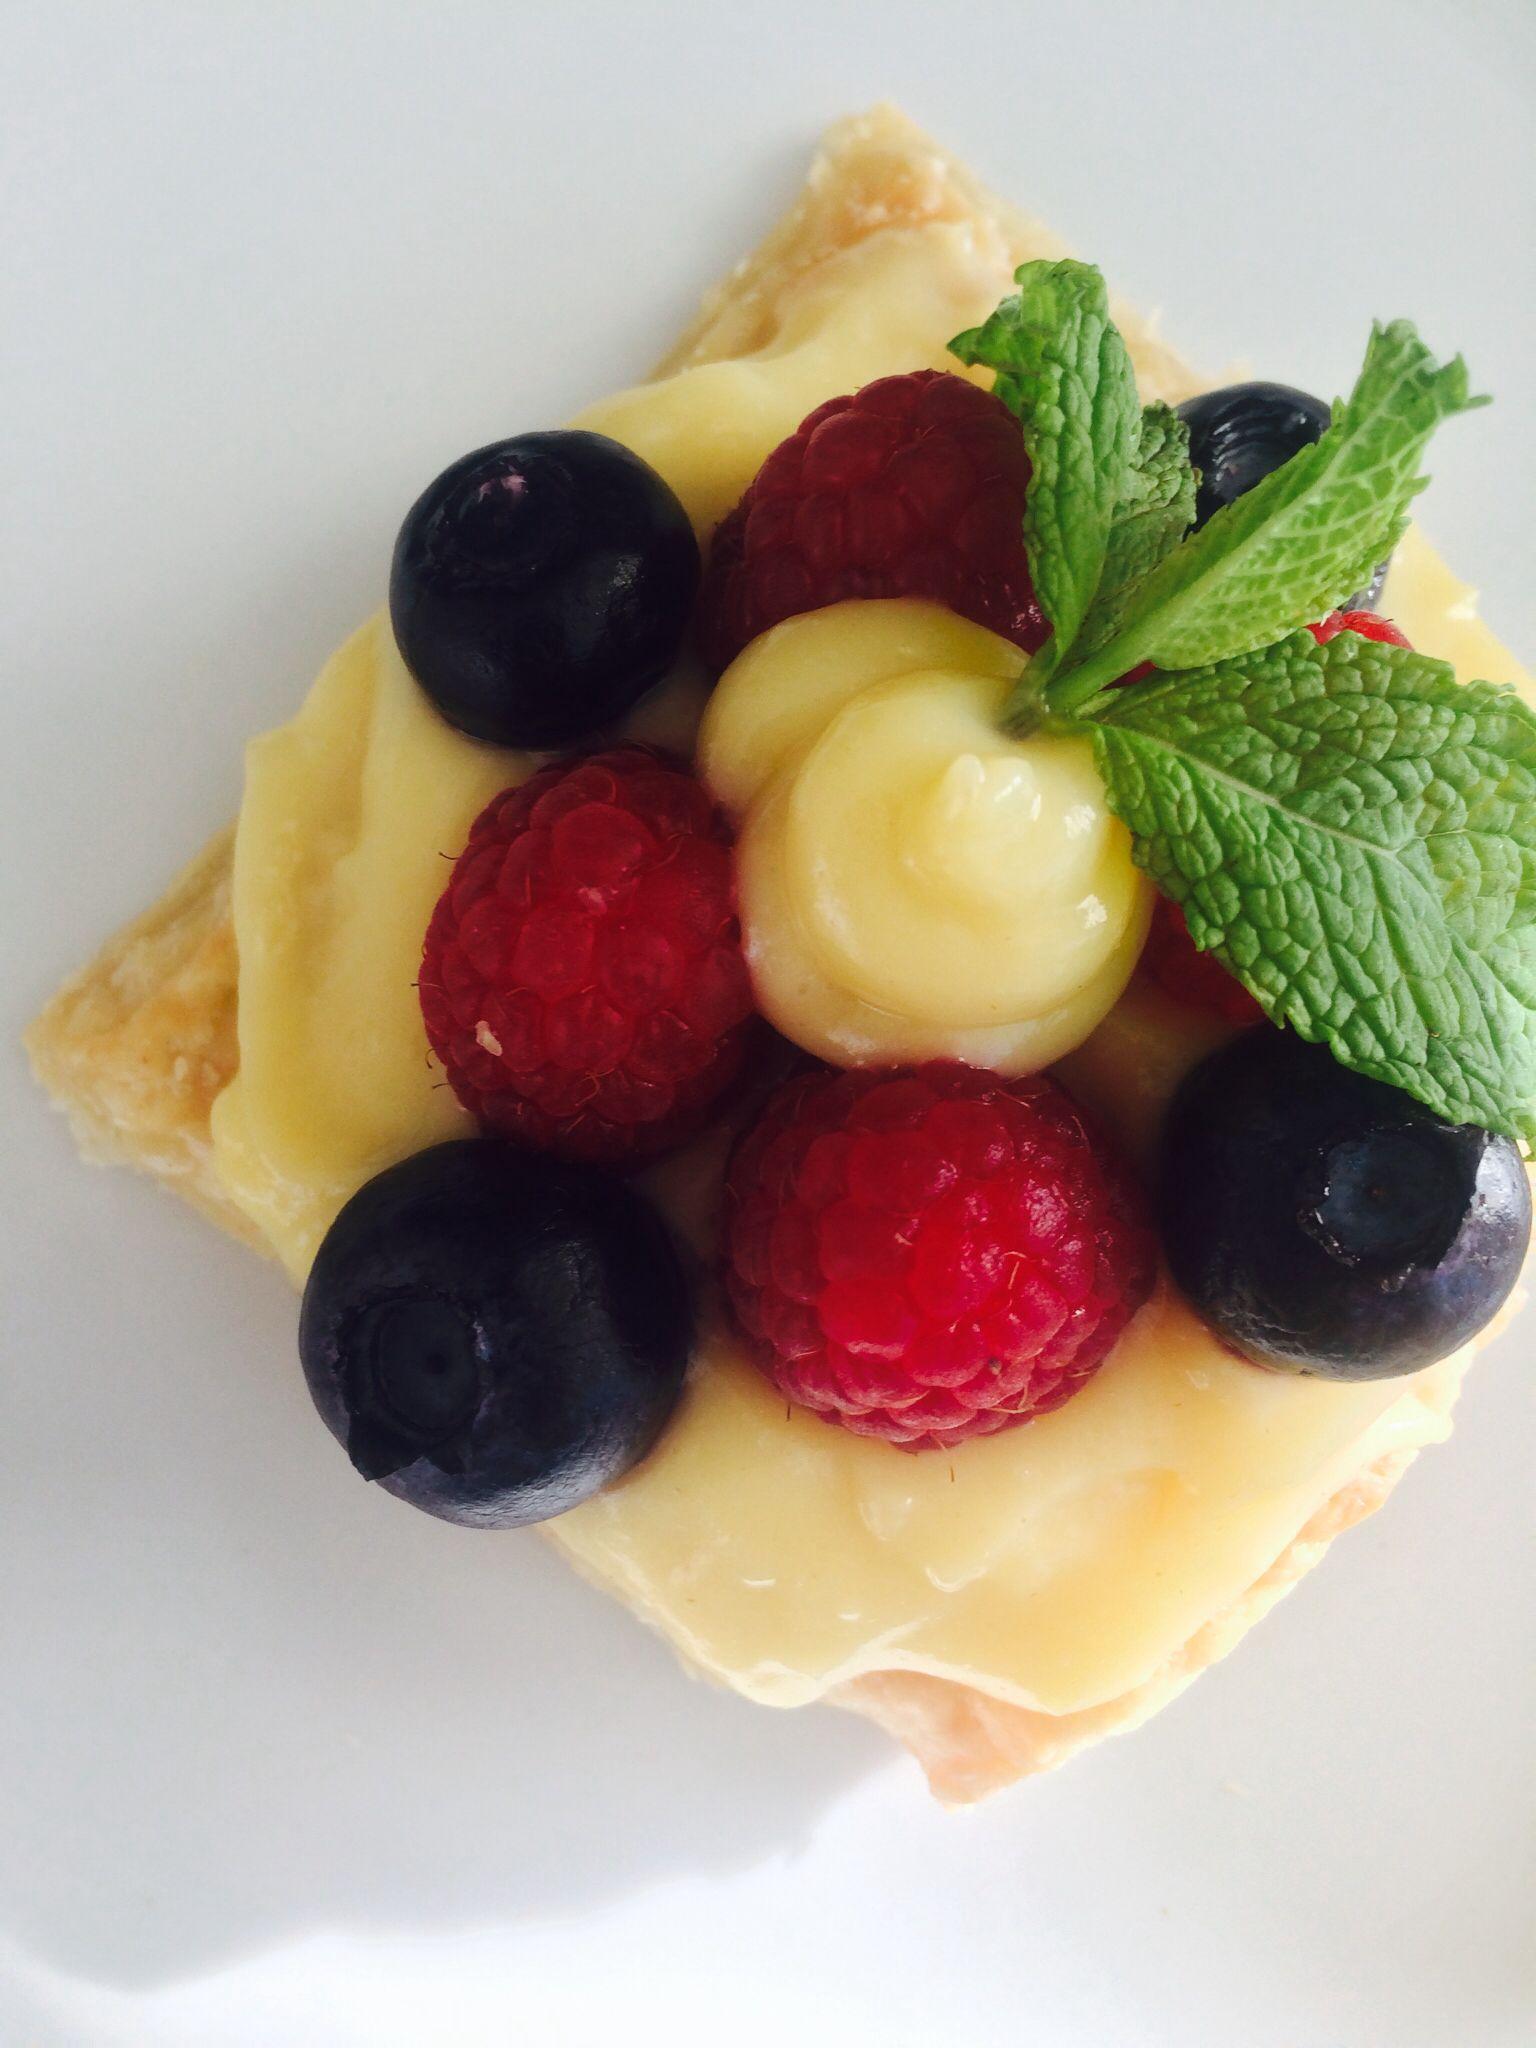 Raspberries, Blueberries, and Strawberries Puff Pastry with Vanilla Custard